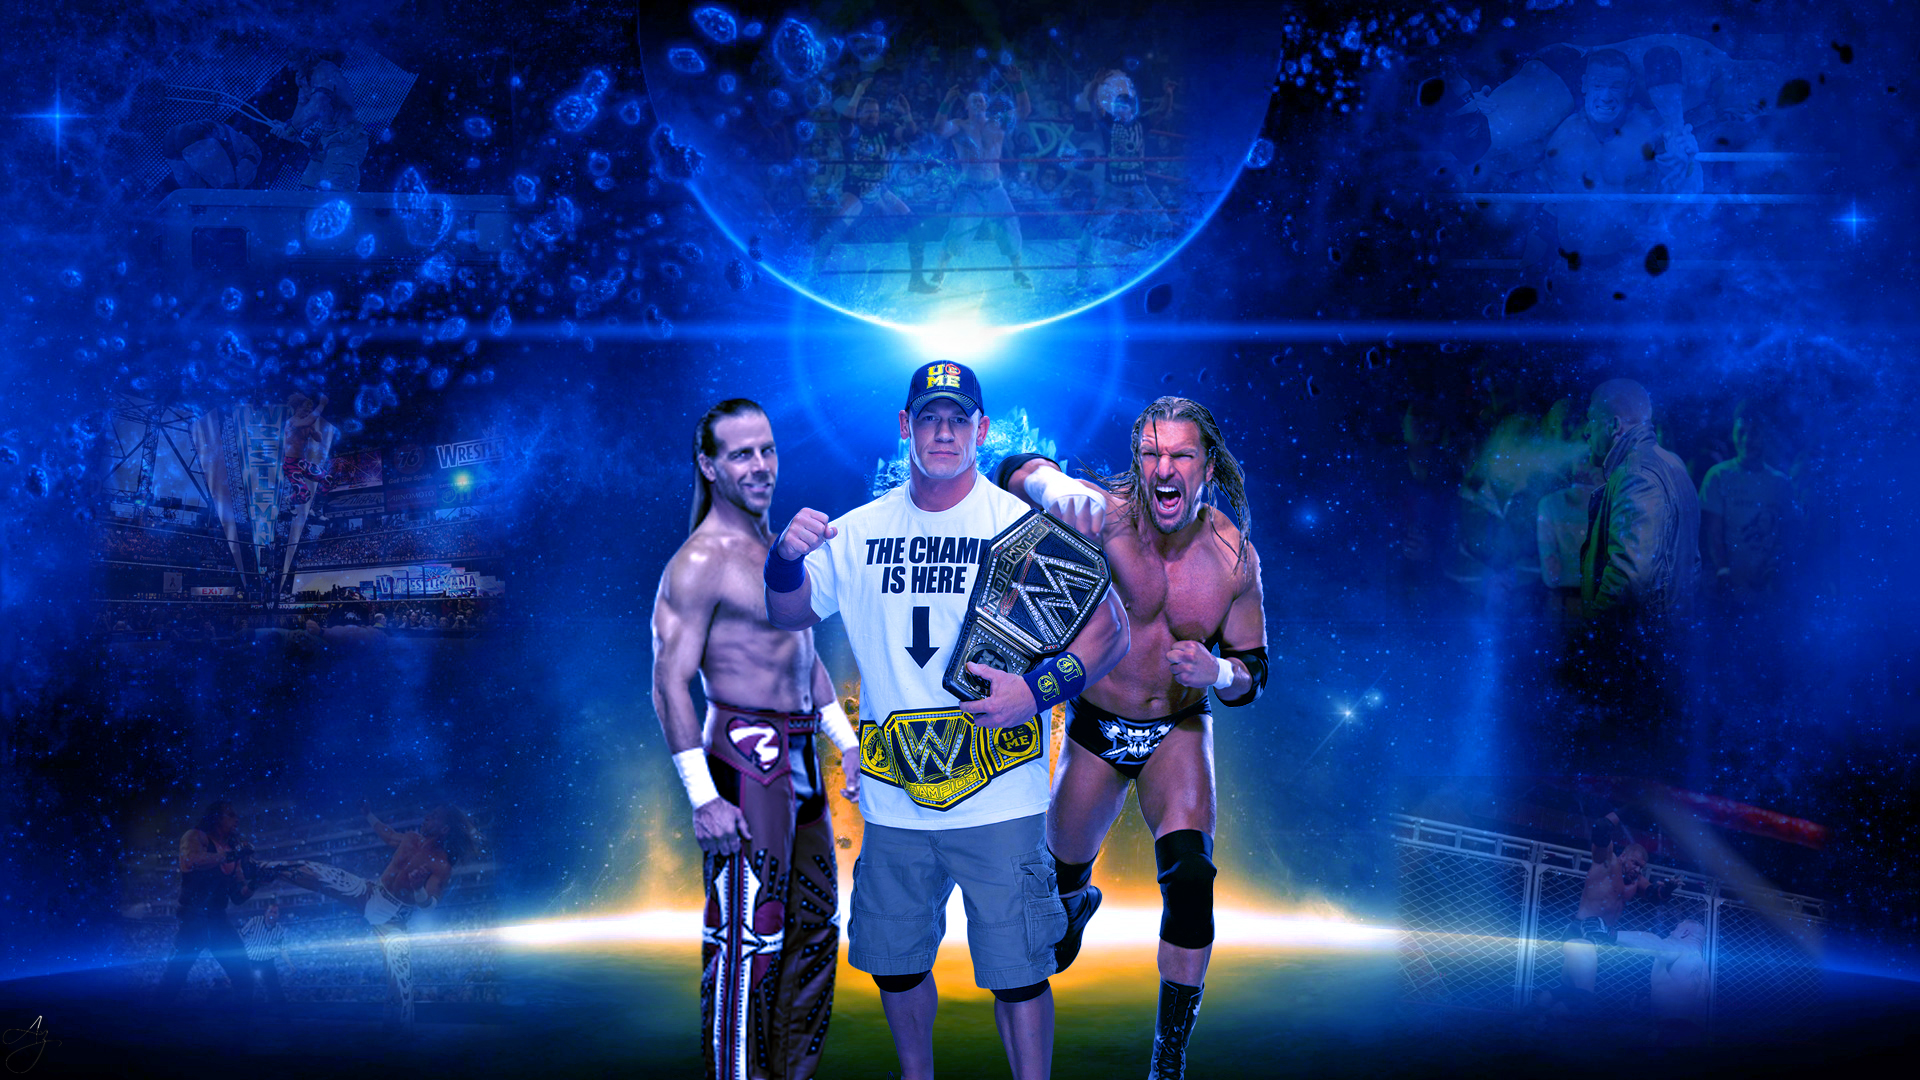 Shawn Michaels Triple H And John Cena Wallpaper by FunkyAli on